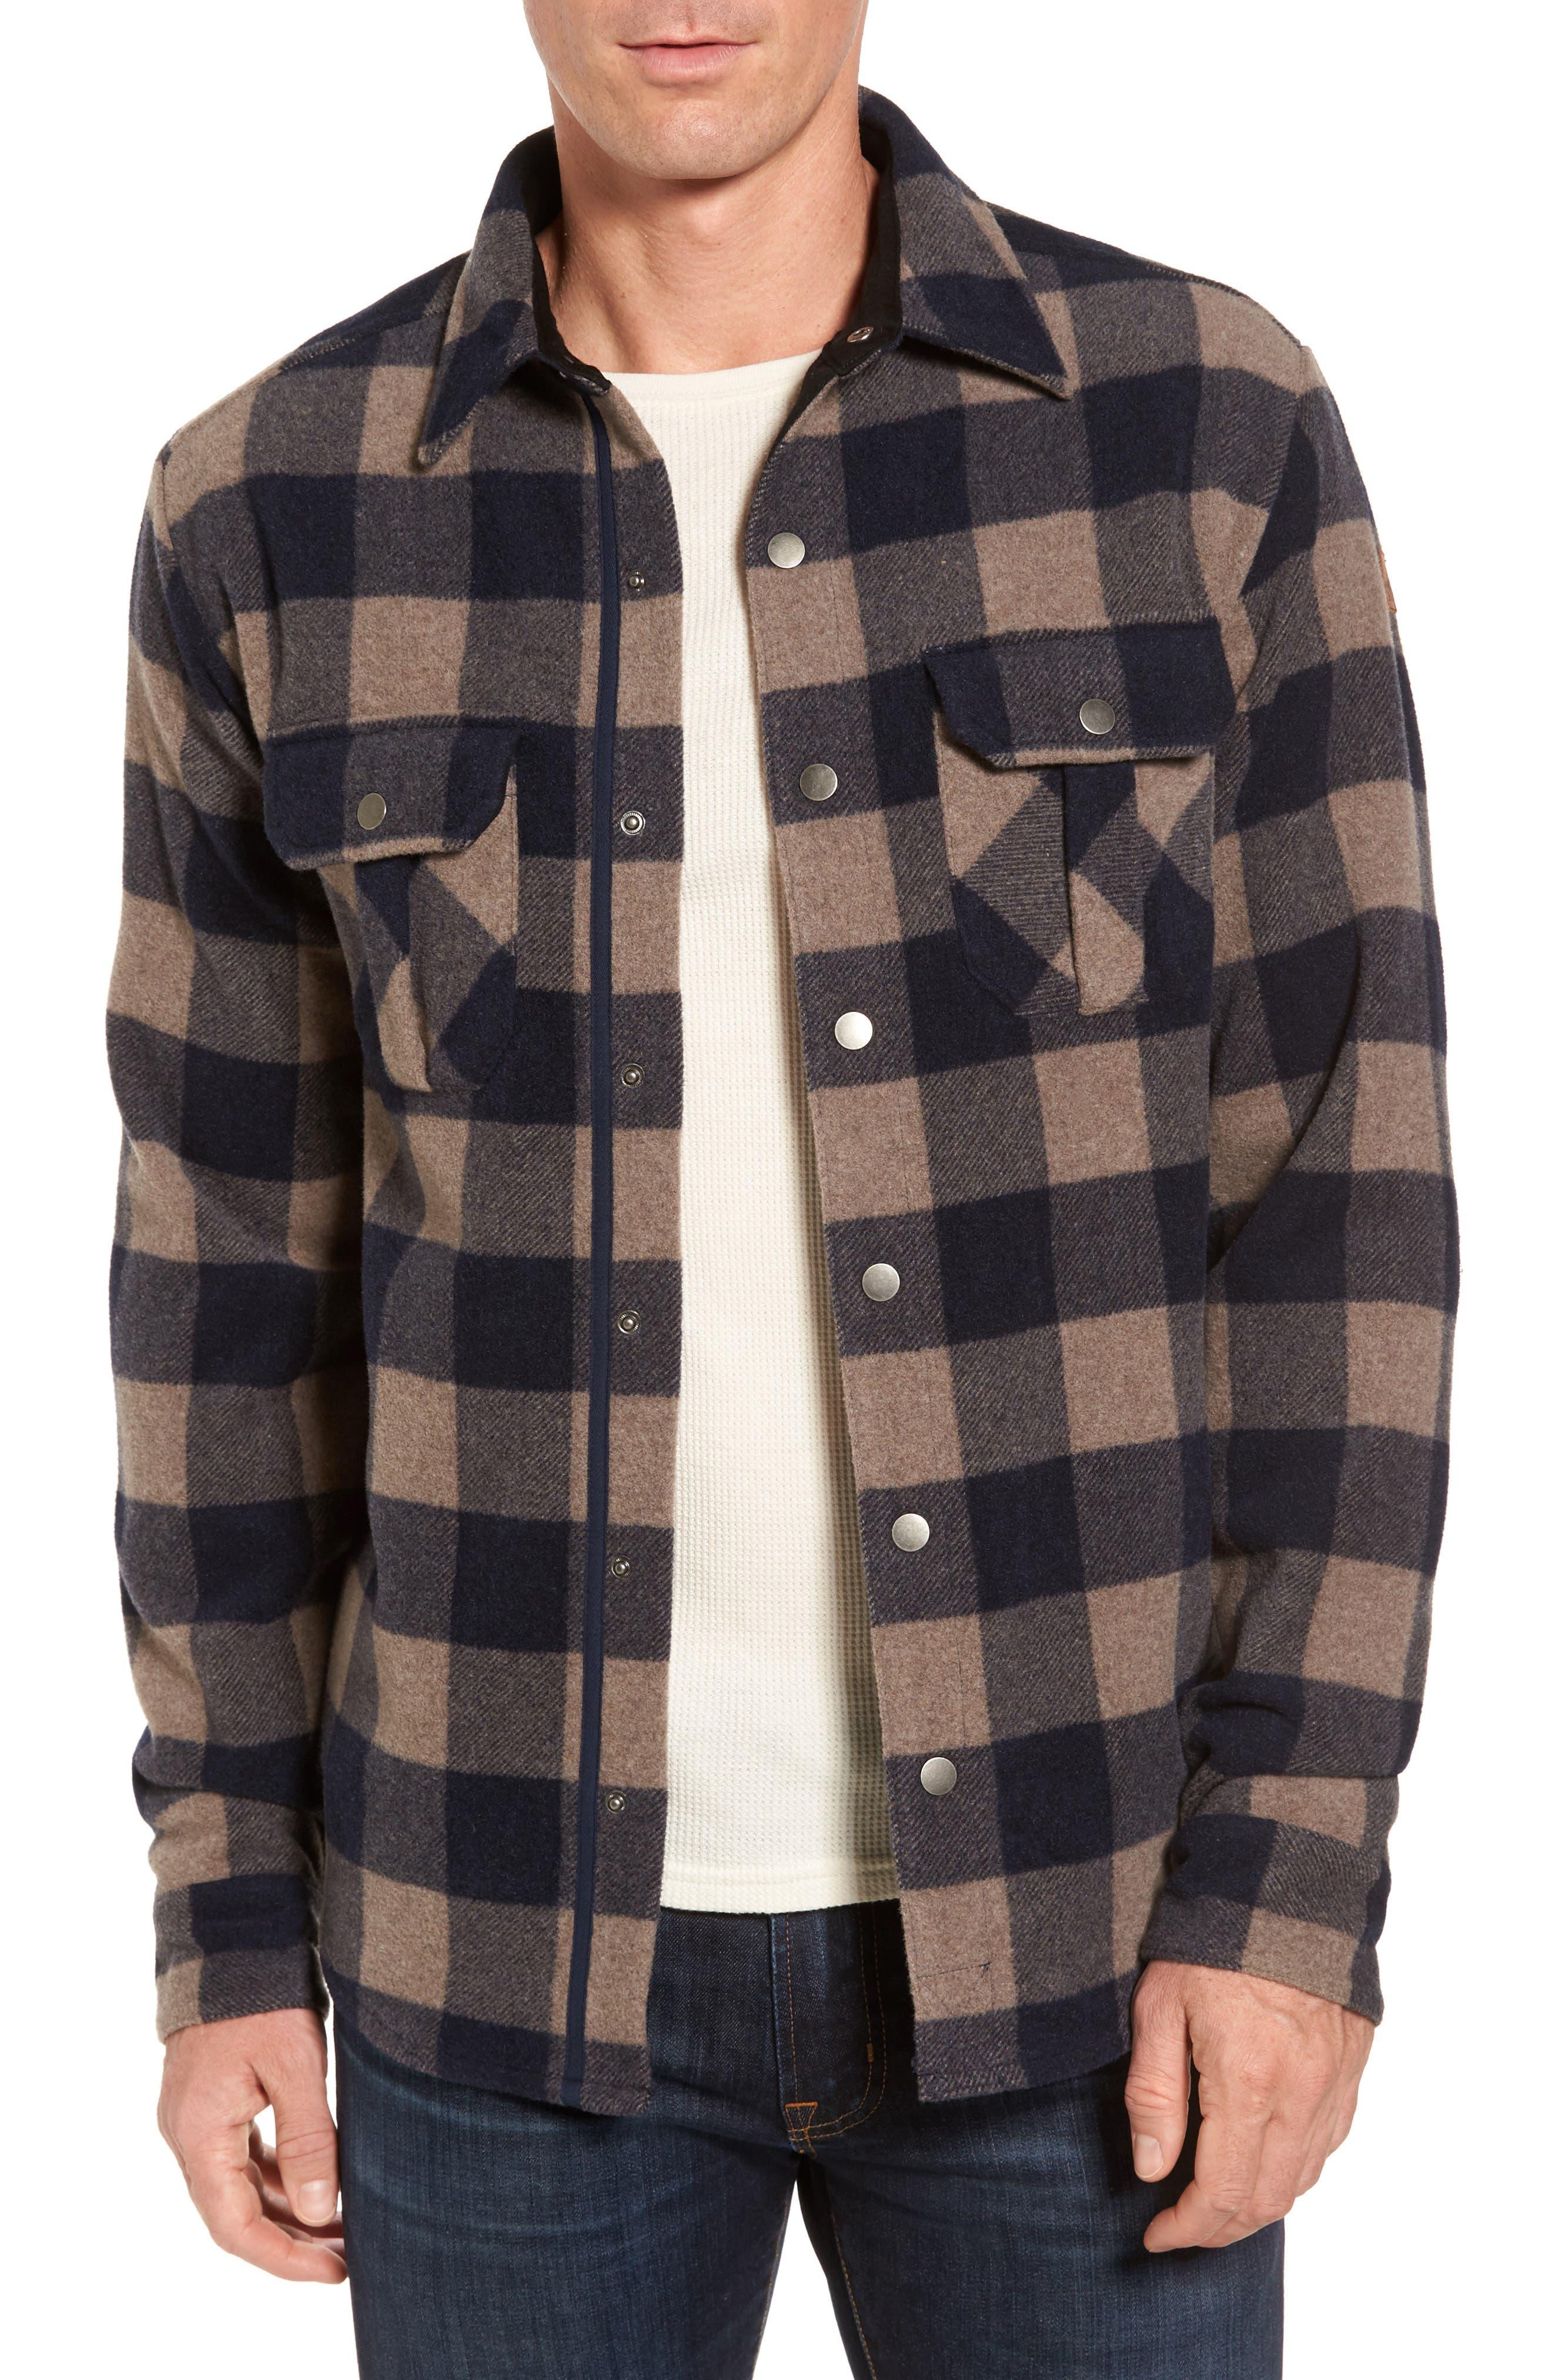 Main Image - SmartWool Anchor Line Flannel Shirt Jacket